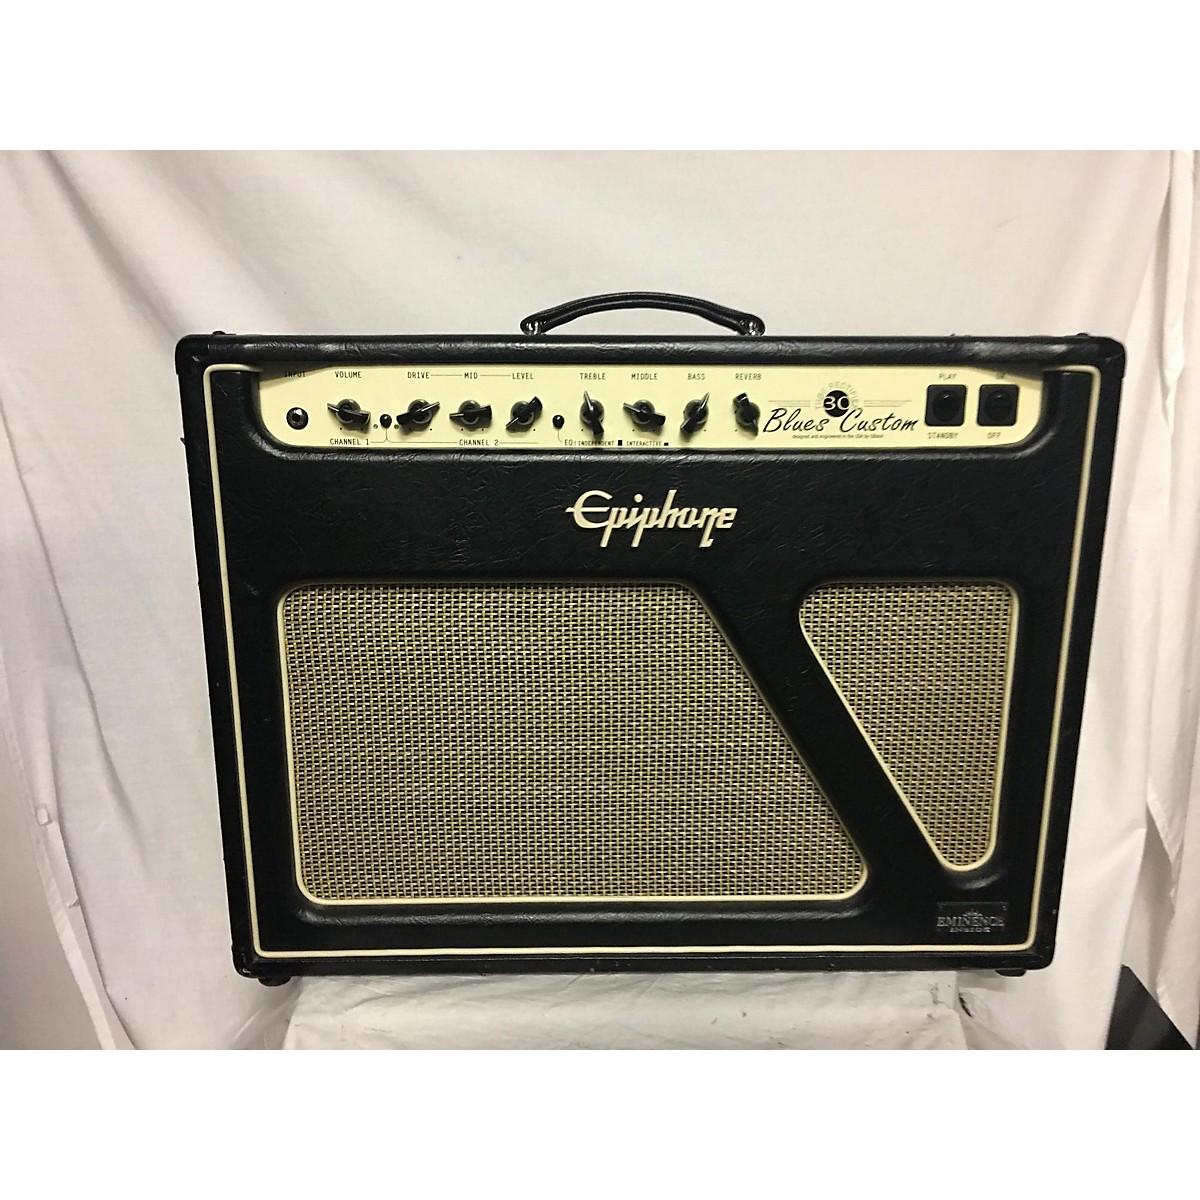 Epiphone BLUES CUSTOM 30 Tube Guitar Combo Amp